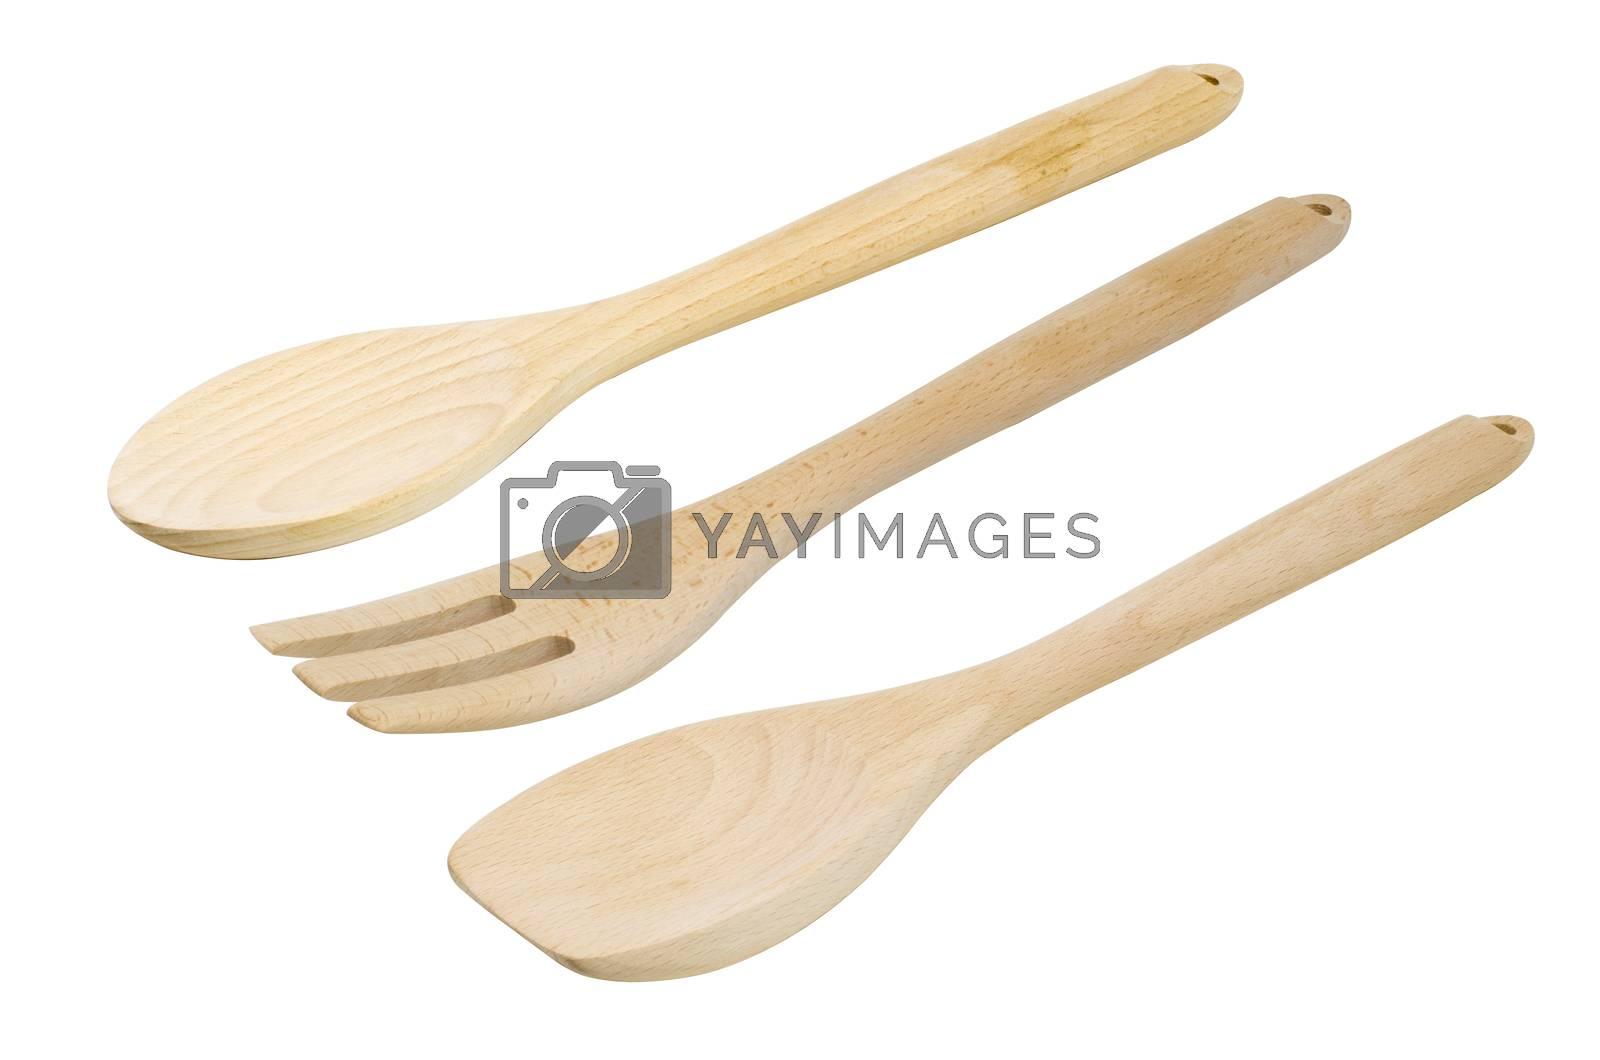 Wooden kitchen utensils set, isolated on white background